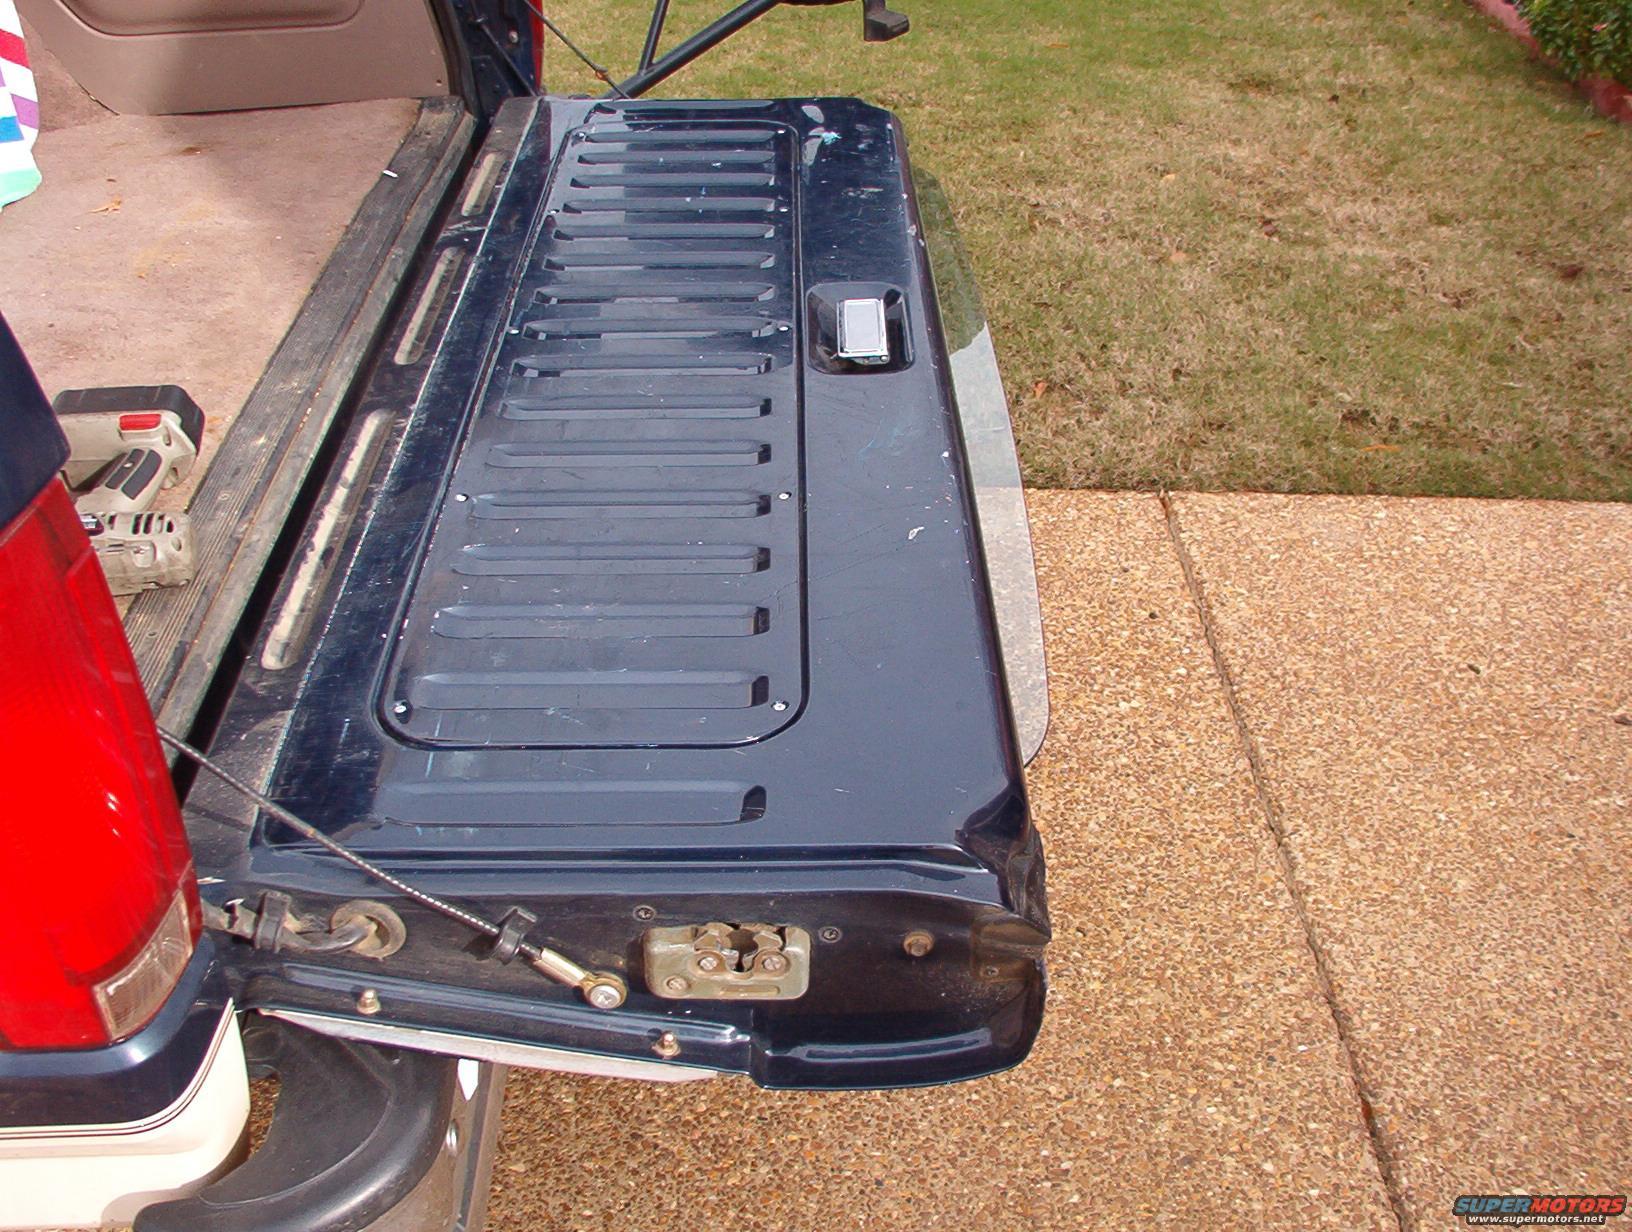 1983 Ford Bronco Tailgate Tech Picture Supermotors Net